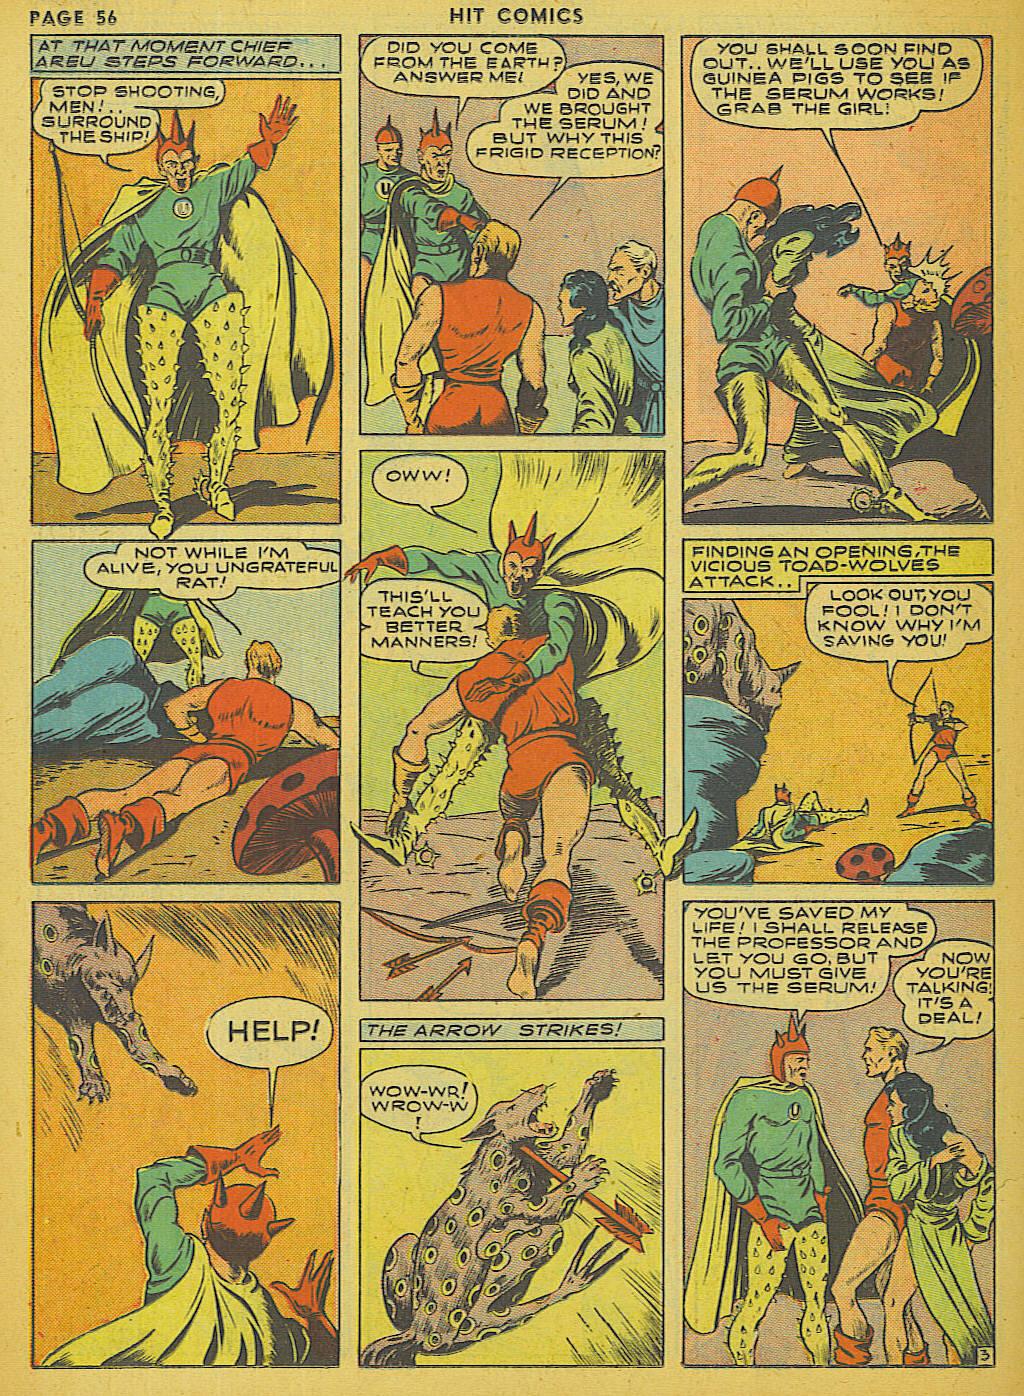 Read online Hit Comics comic -  Issue #13 - 58